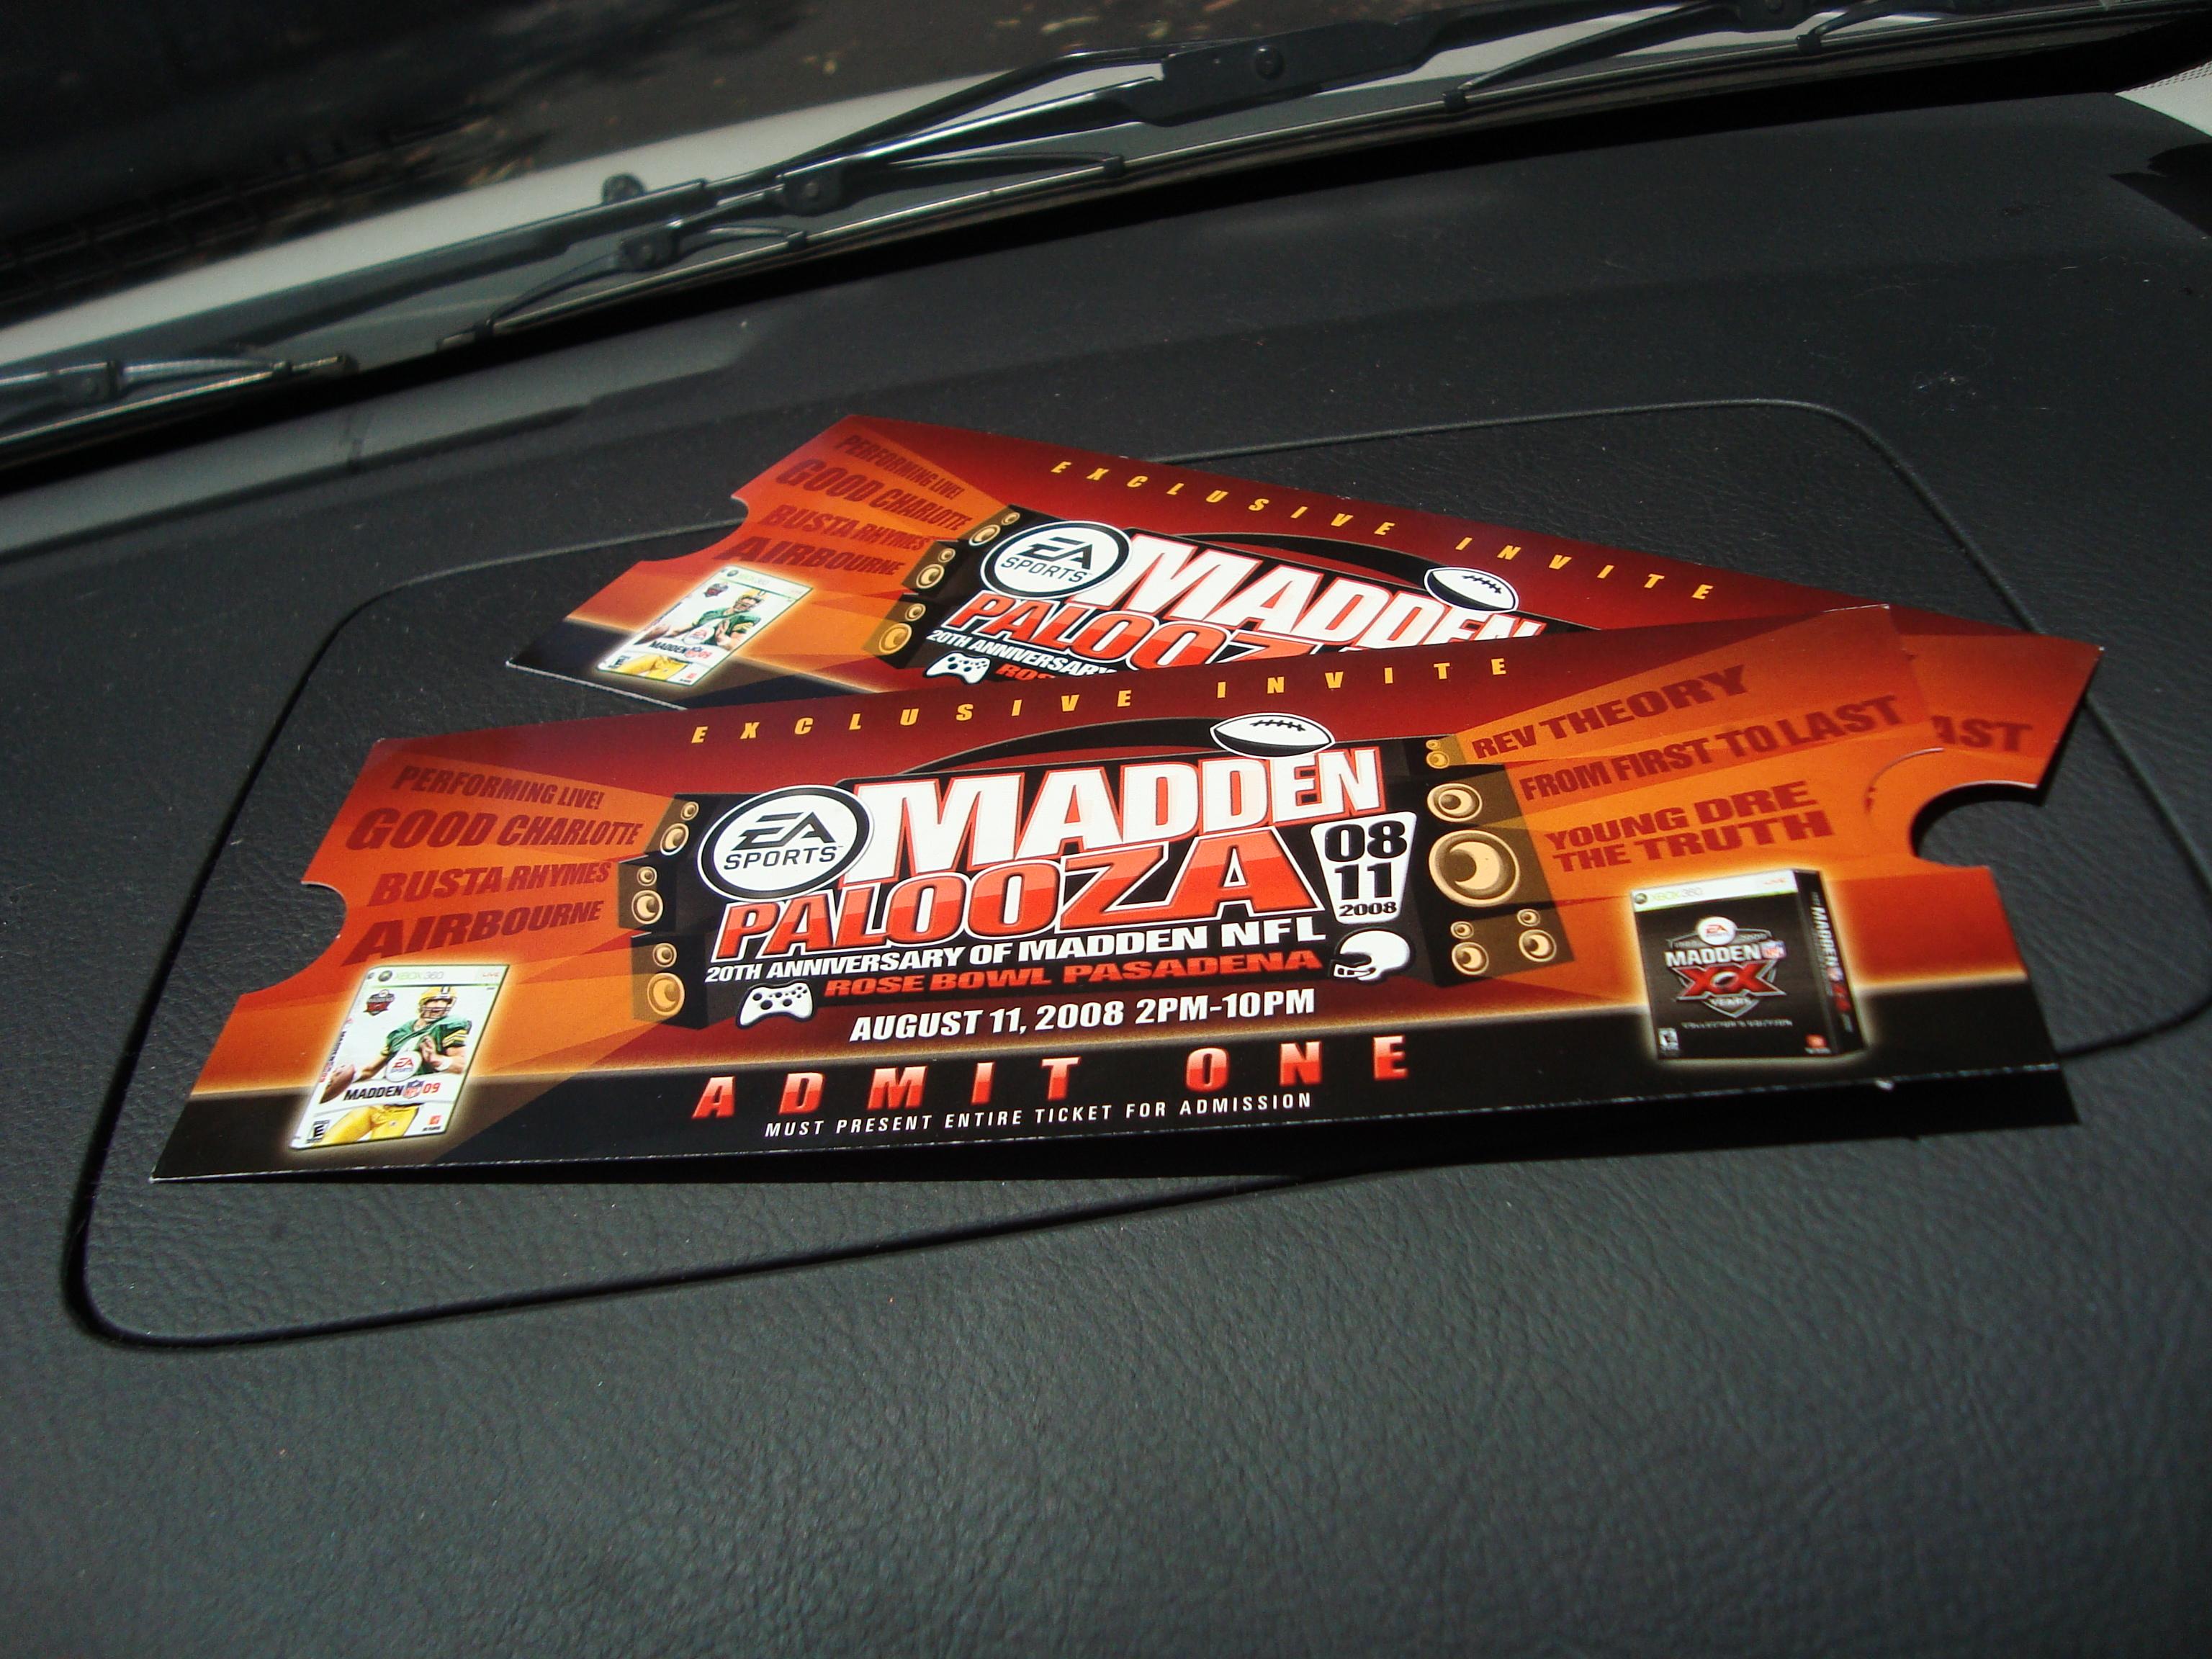 My MaddenPalooza Tickets